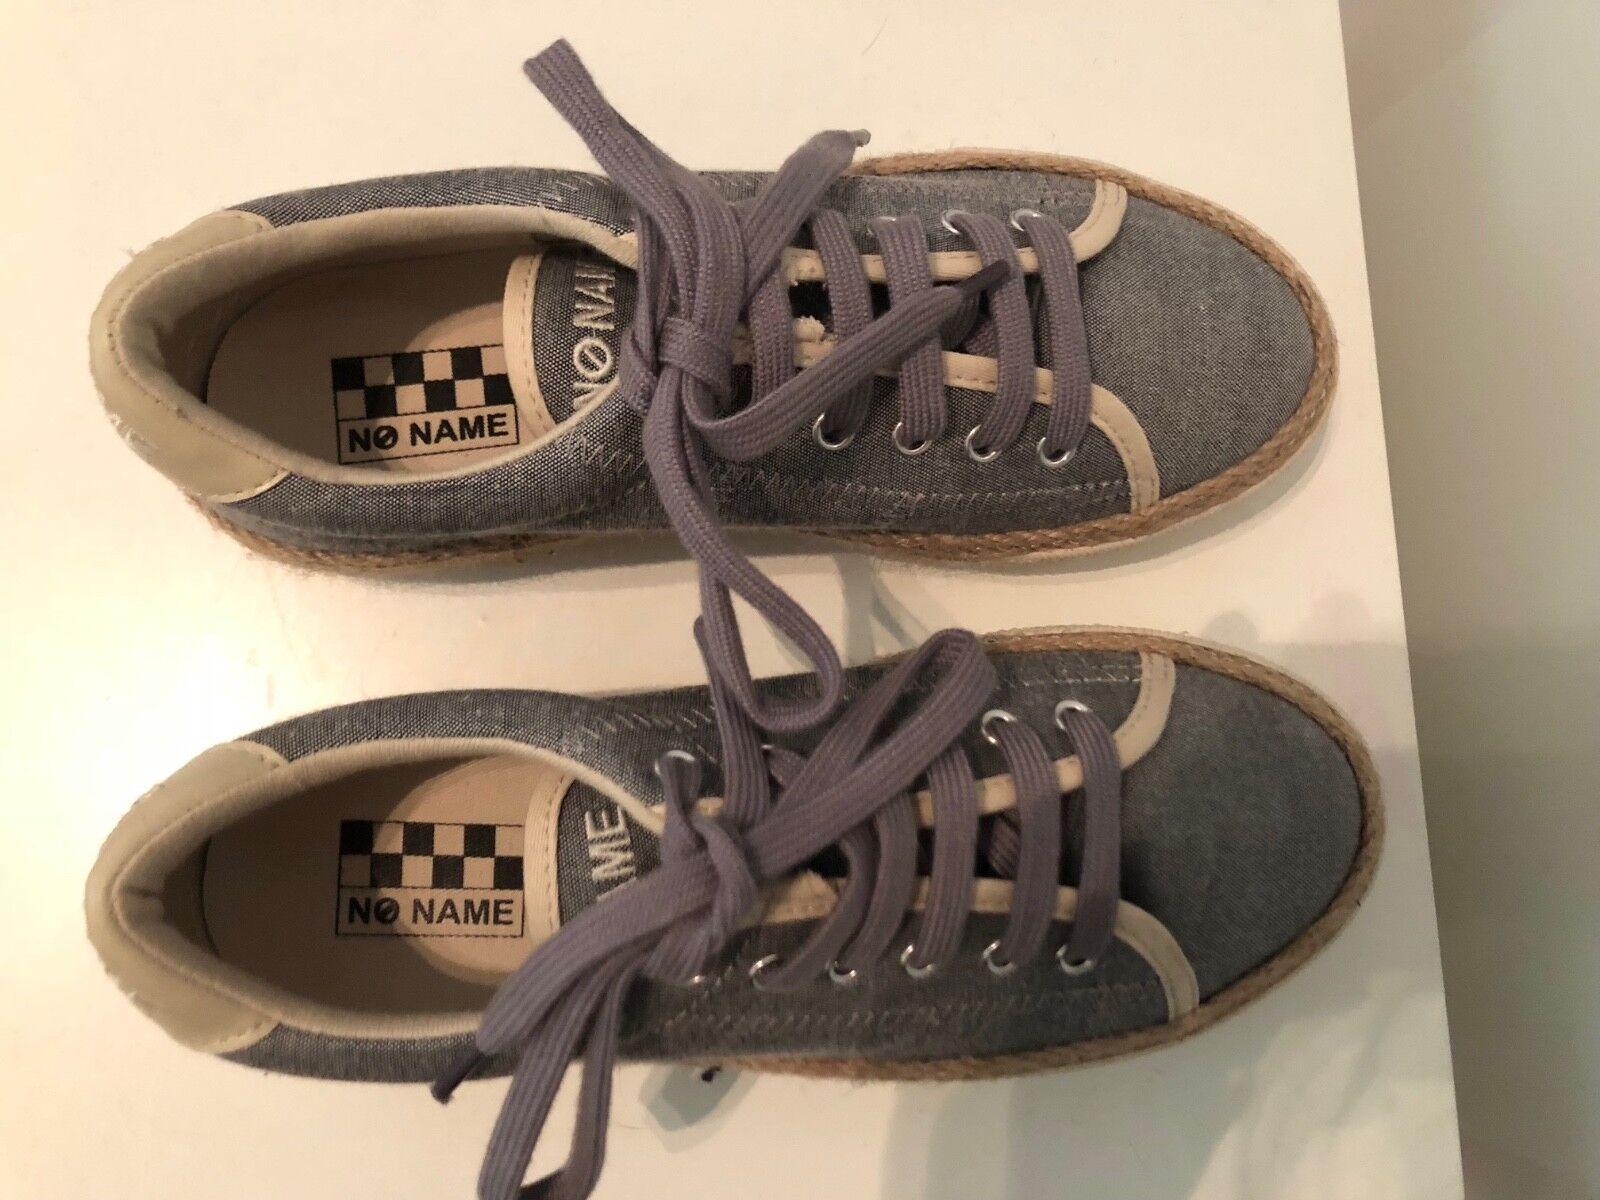 No Name Sneaker Sneakers Plato Blau Grau Sneaker Name Leinen SIZE 37 NEW Damenschuhe DAMEN 9983ef